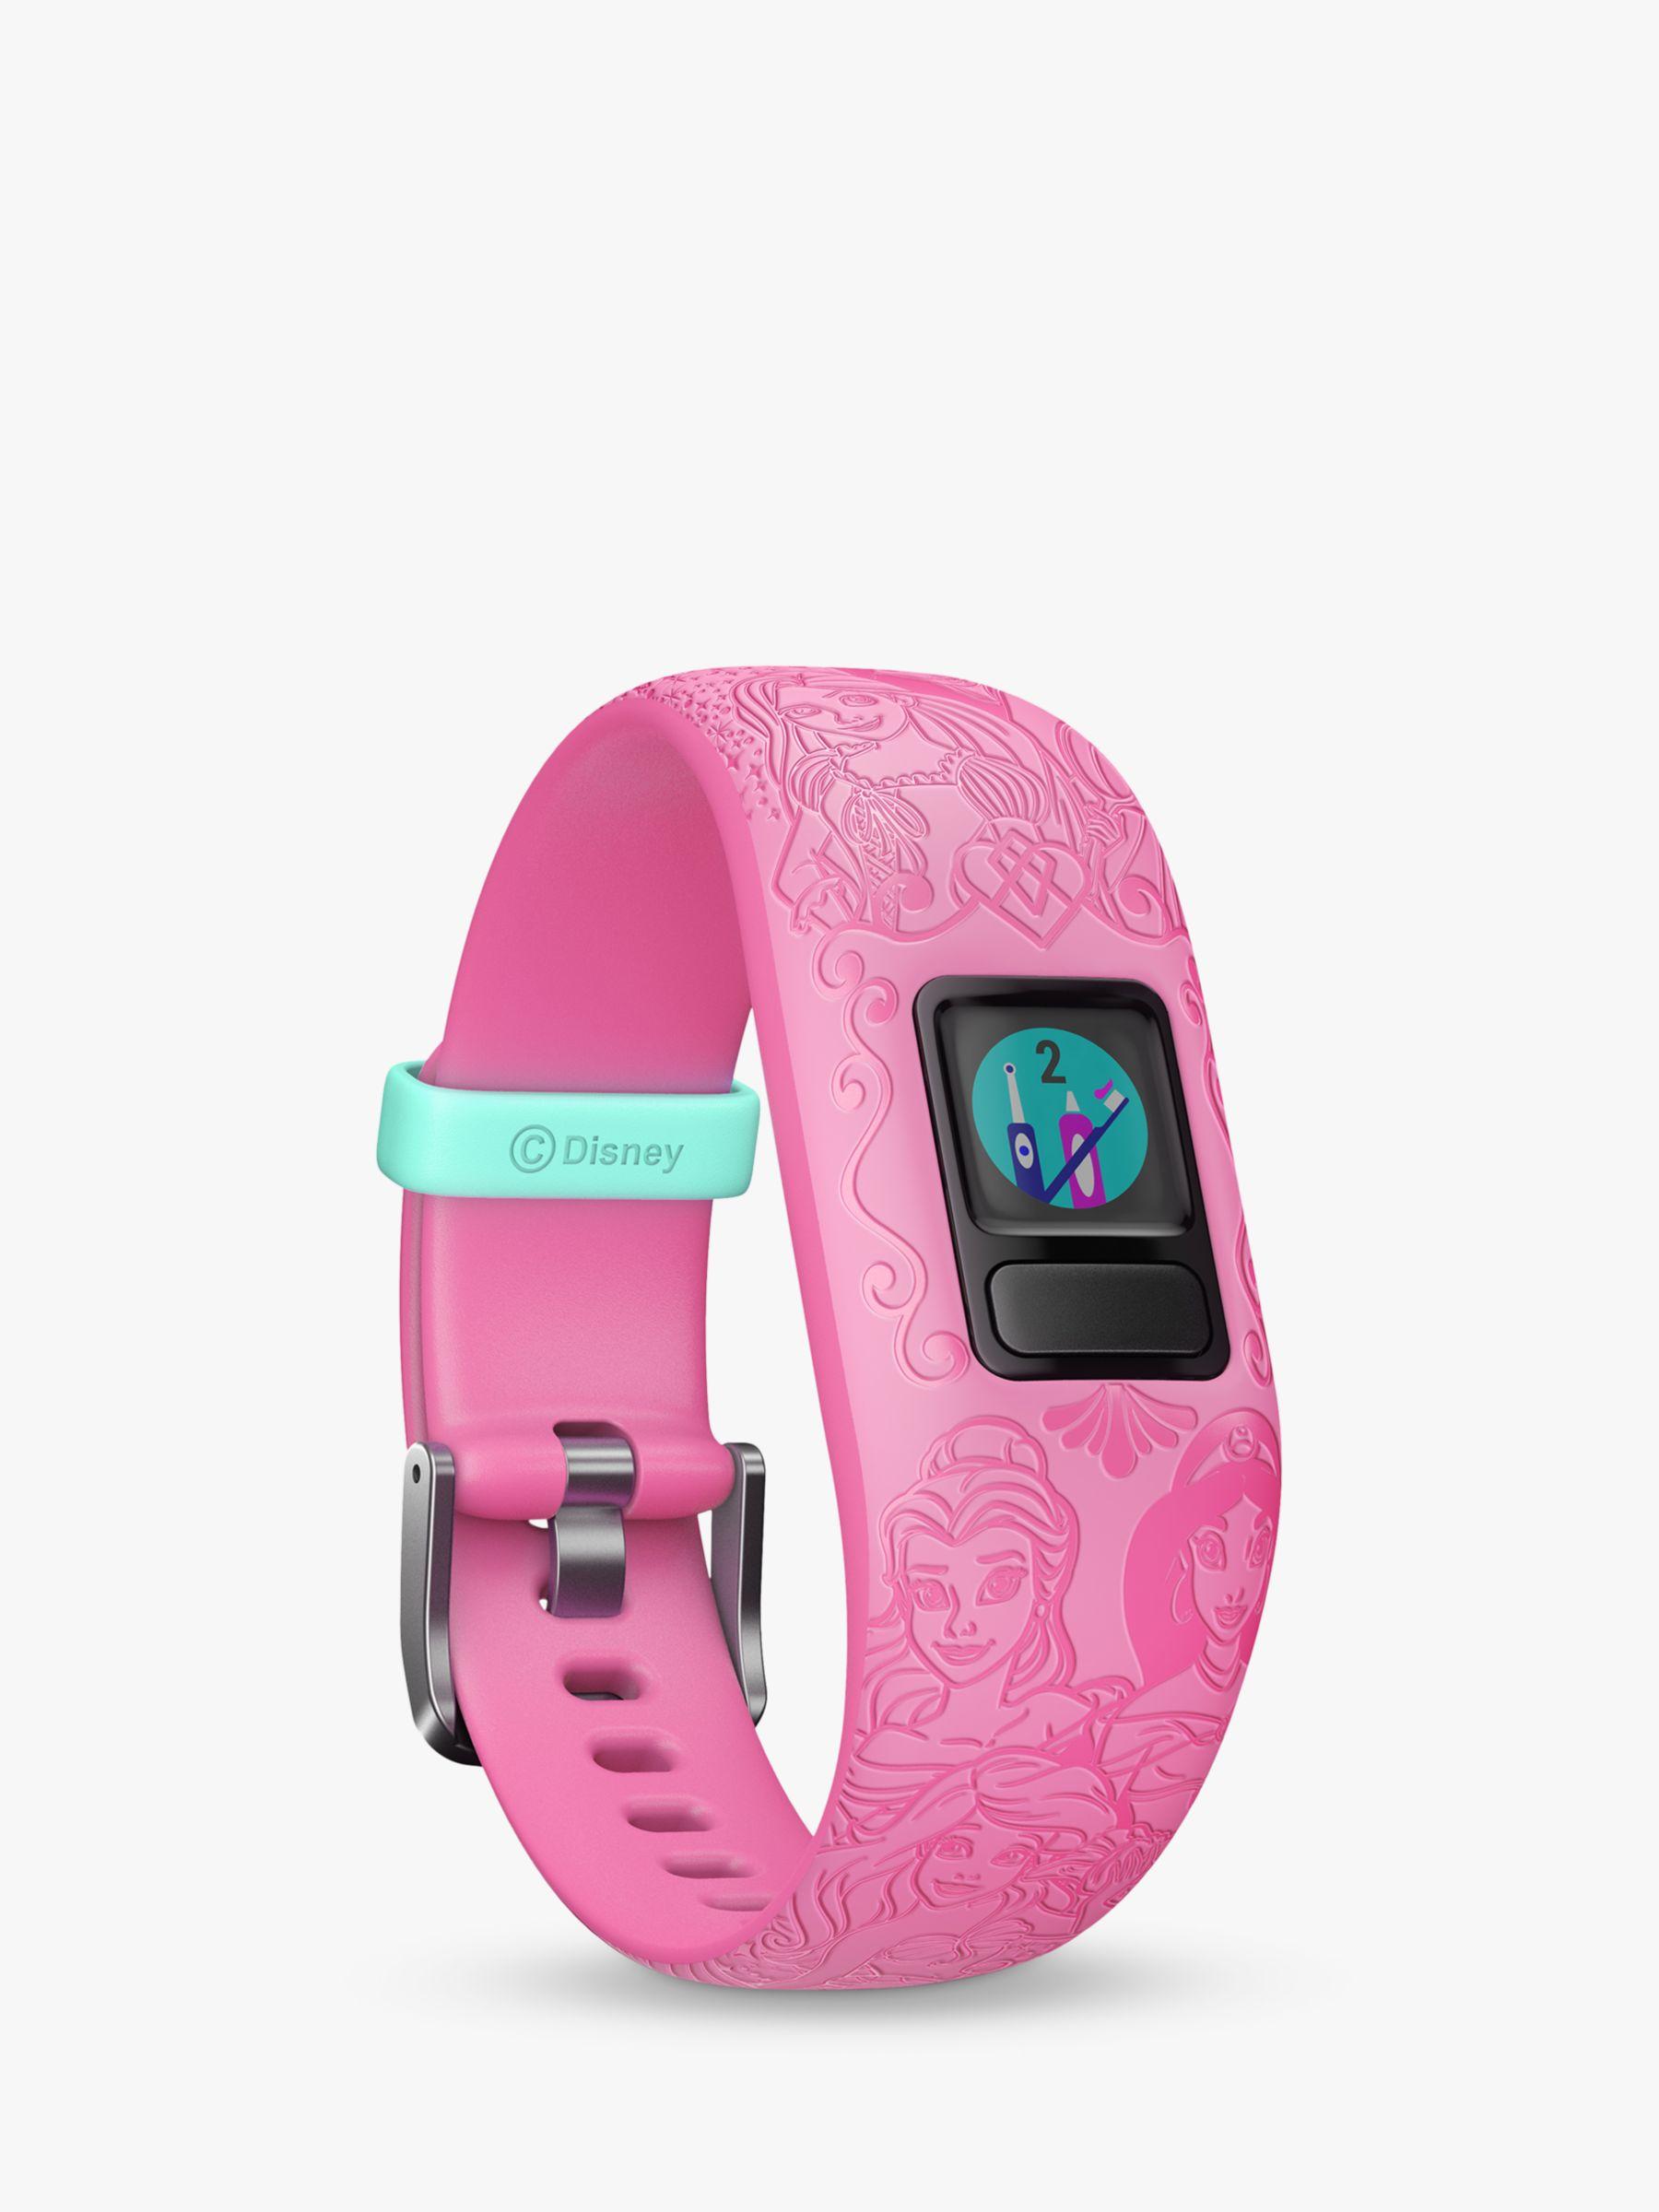 Garmin Garmin vivofit jr. 2, Adjustable Disney Princess Activity Tracker and Watch for Children